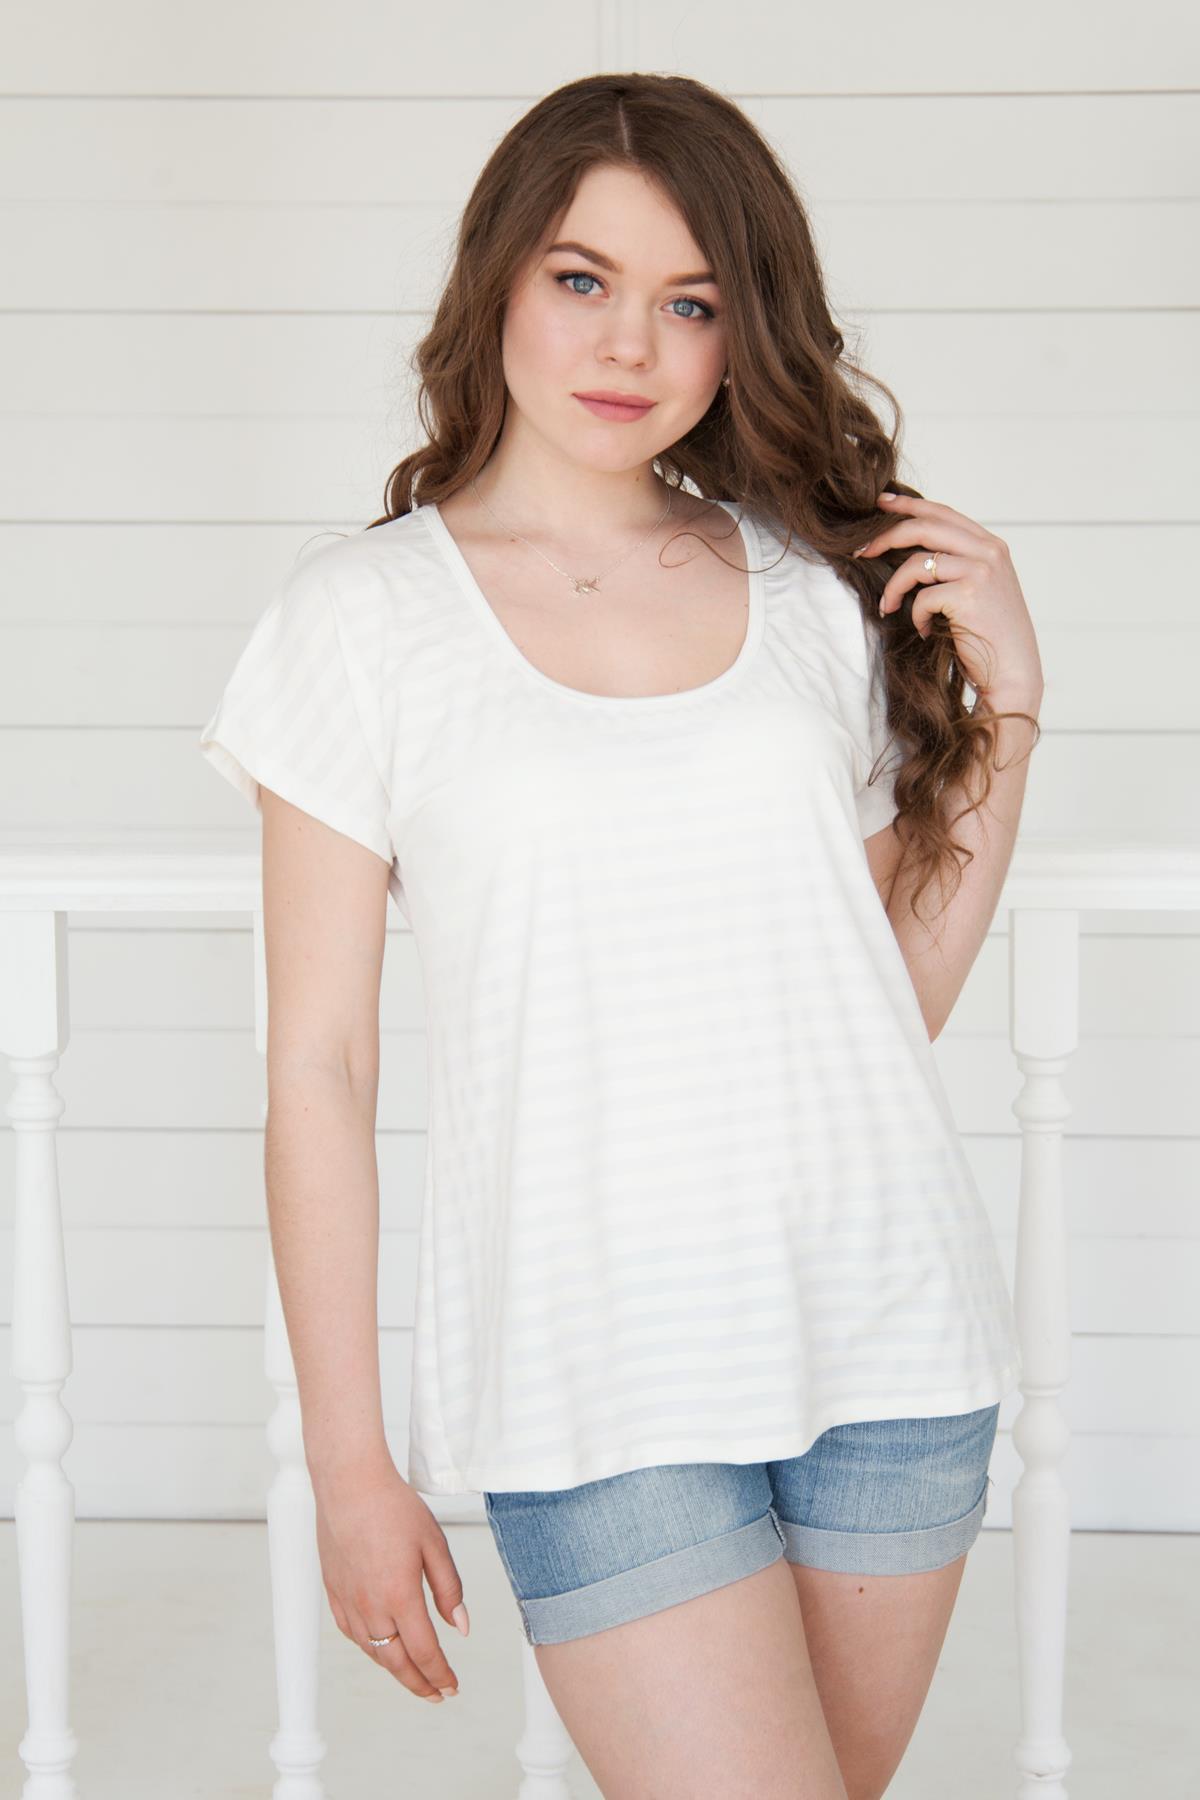 Жен. футболка арт. 19-0161 Молочный р. 54Майки и футболки<br>Факт. ОГ: 114 см <br>Факт. ОТ: 116 см <br>Факт. ОБ: 124 см <br>Длина по спинке: 70 см<br><br>Тип: Жен. футболка<br>Размер: 54<br>Материал: Вискоза